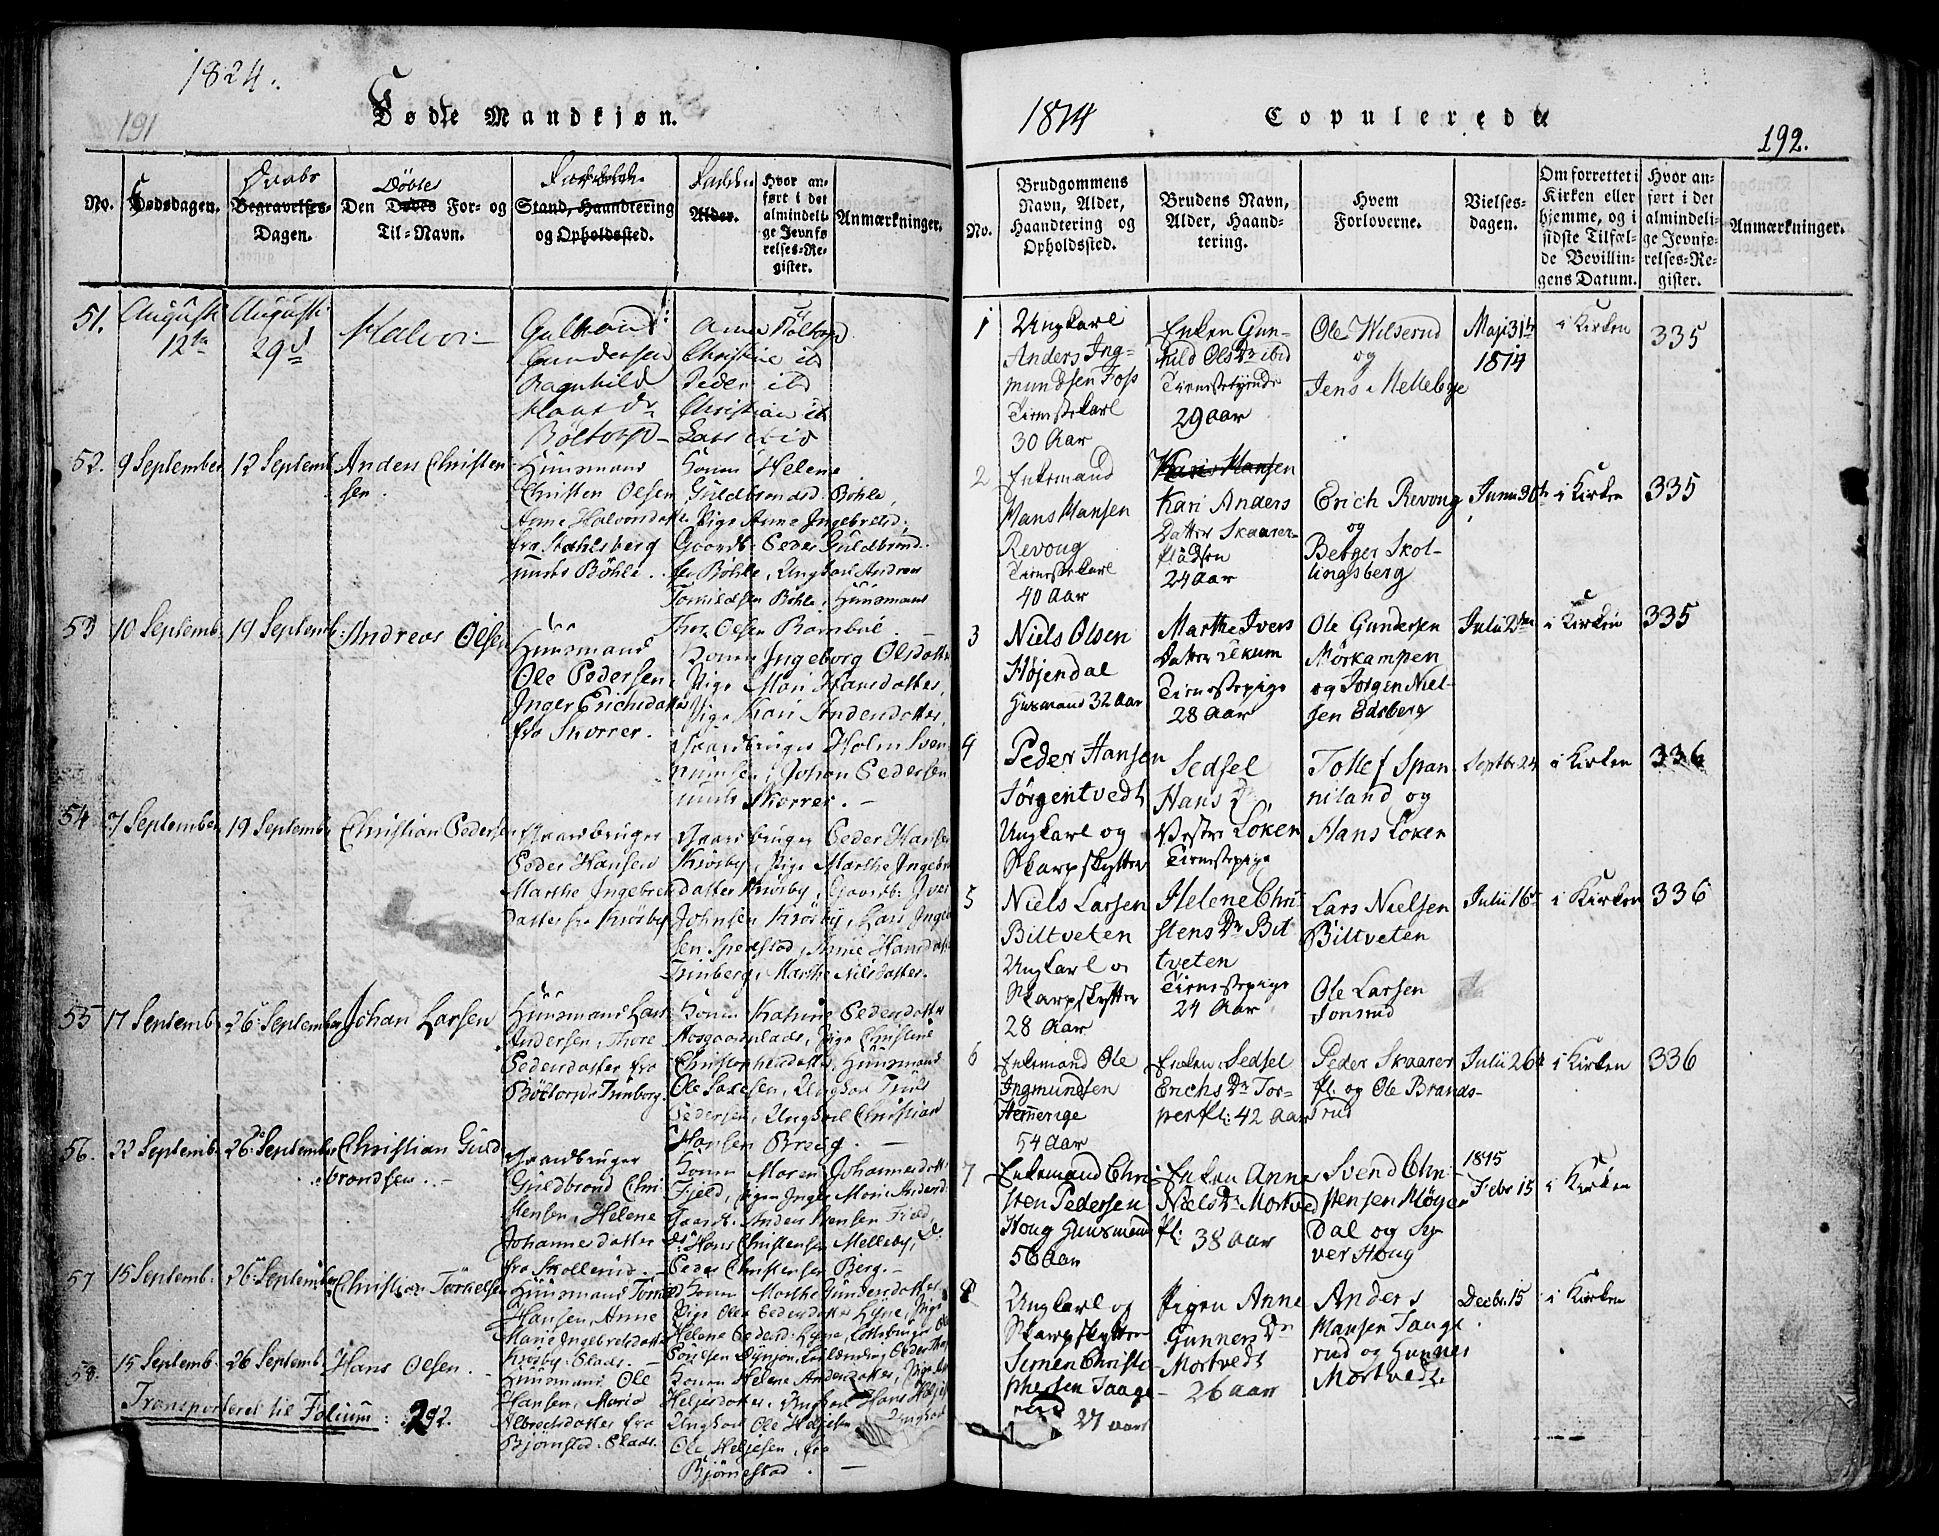 SAO, Eidsberg prestekontor Kirkebøker, F/Fa/L0007: Ministerialbok nr. I 7, 1814-1832, s. 192